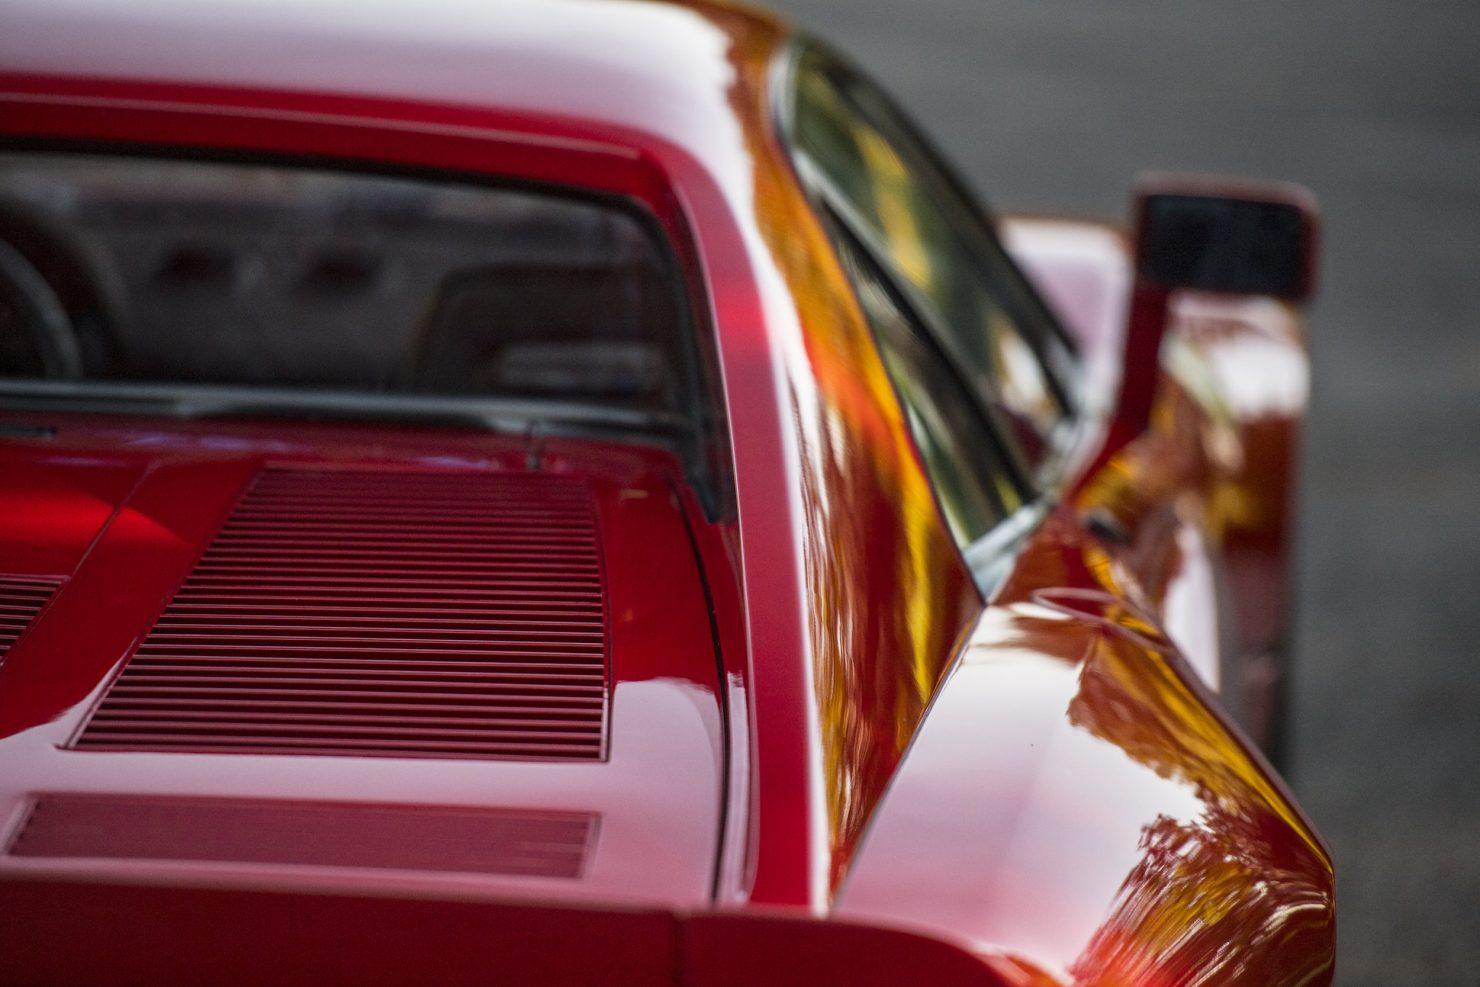 Ferrari 288 GTO 5 1480x987 - 1985 Ferrari 288 GTO